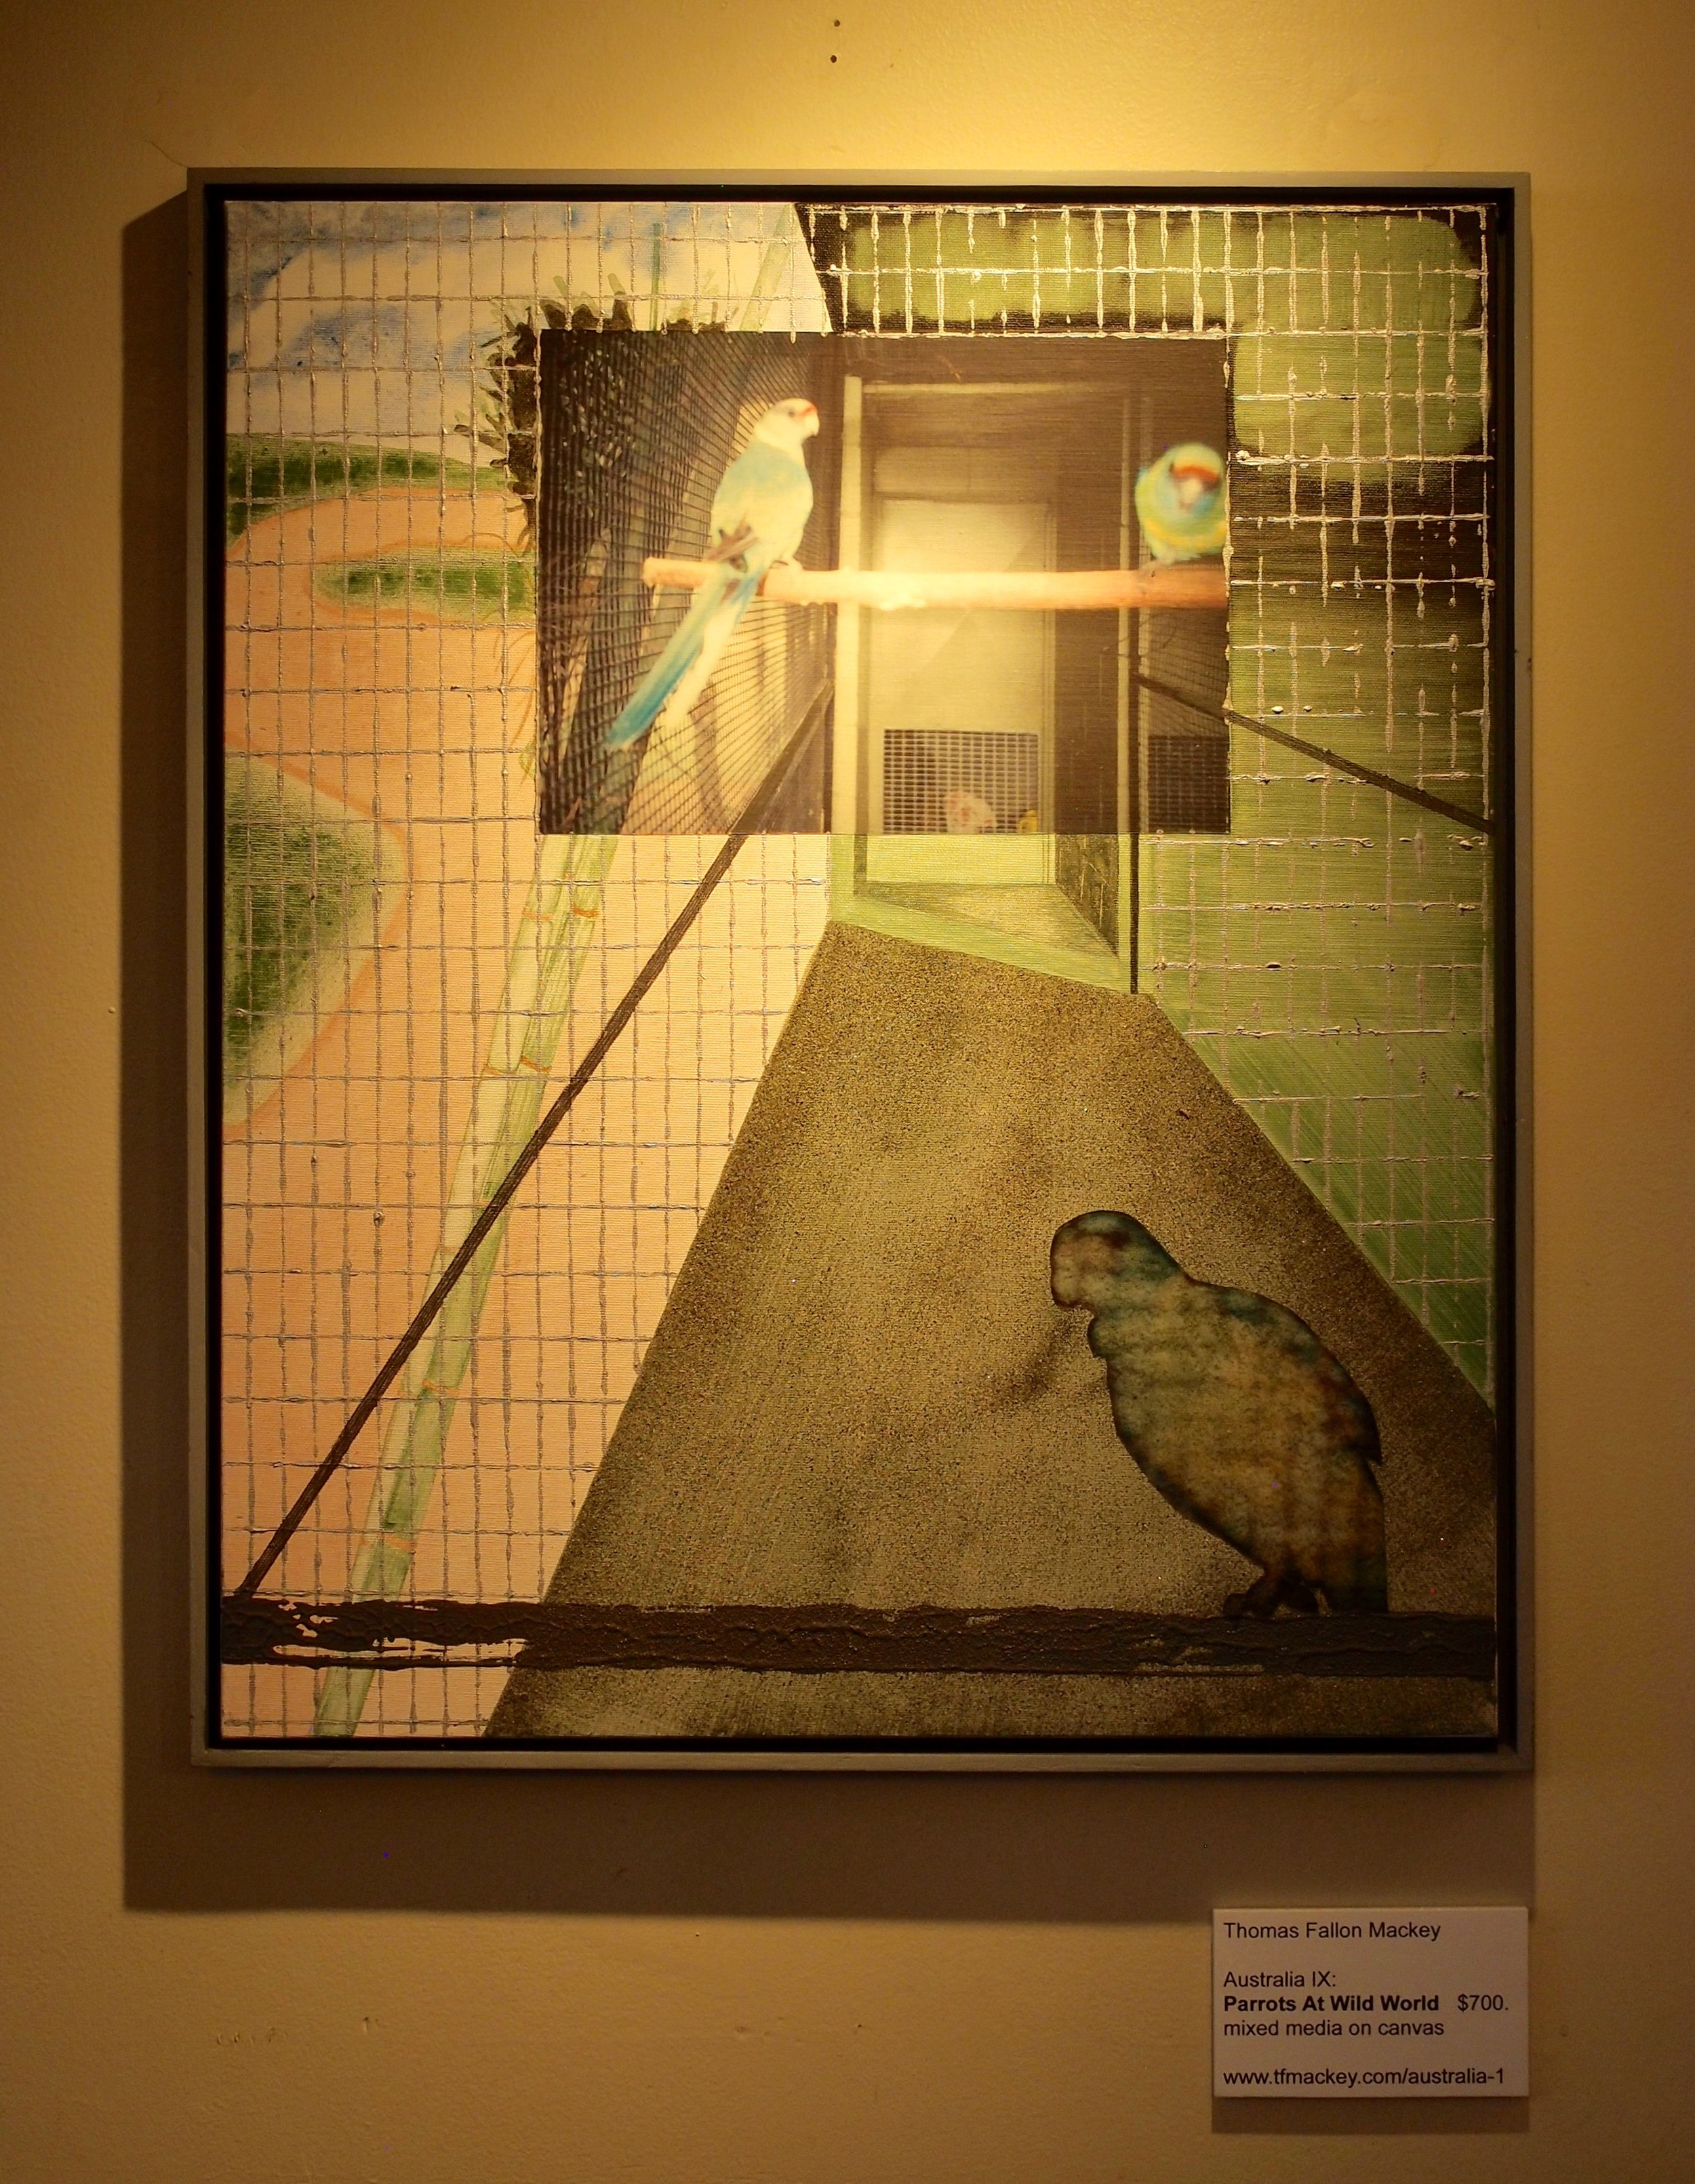 "Australia IX: Parrots At Wild World mixed media on canvas (25 x 21"")"